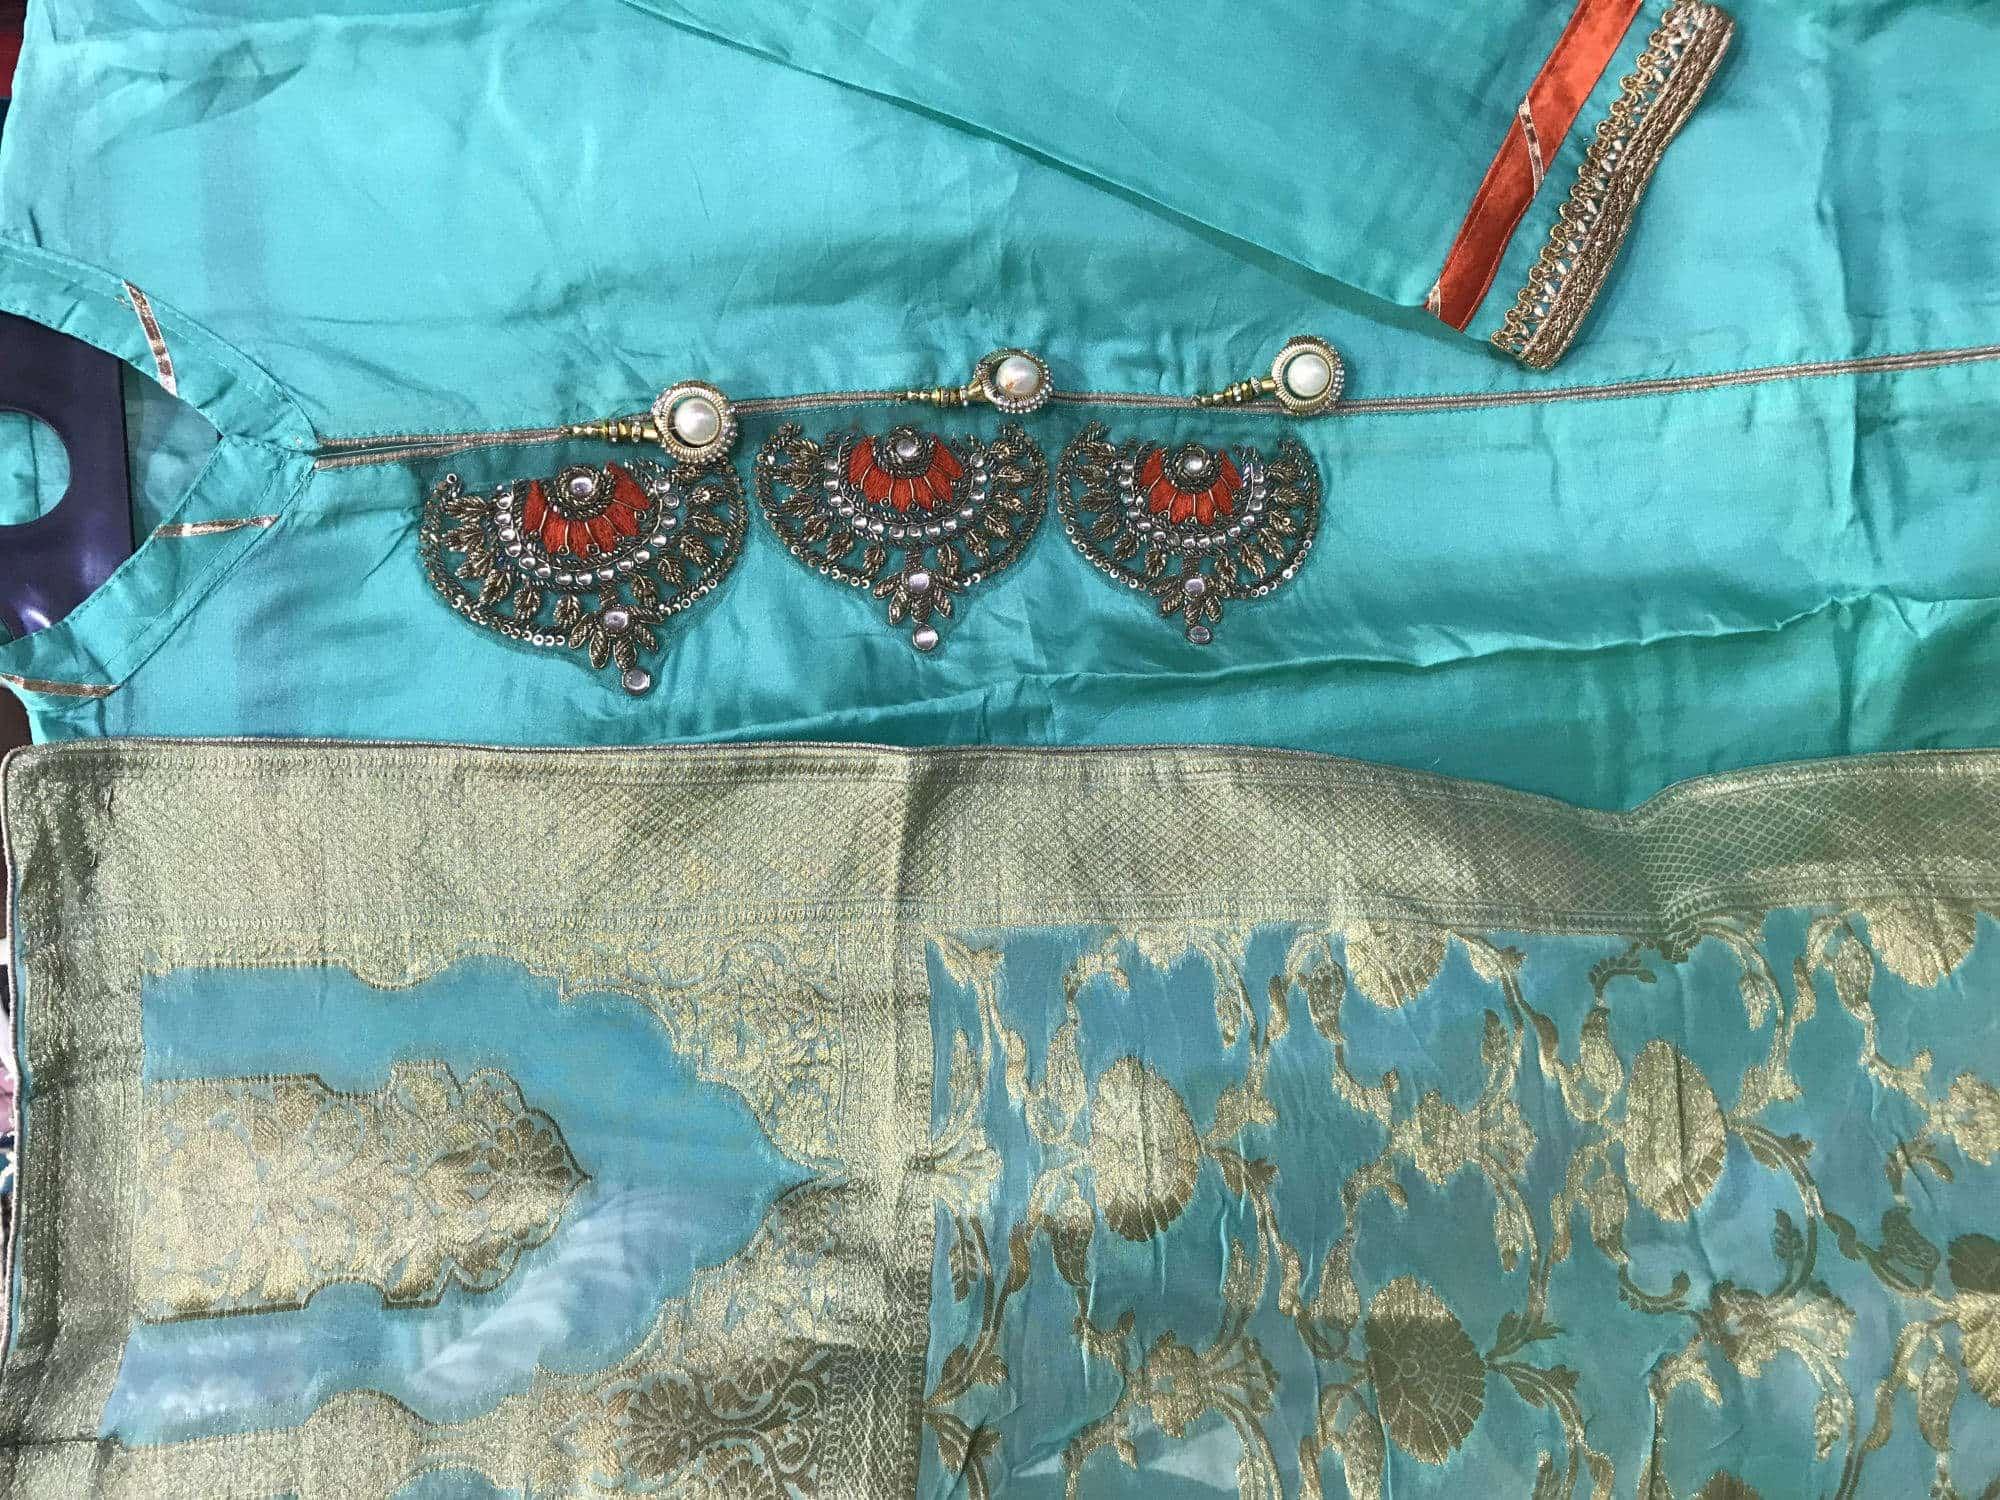 d3baf273b1 Designer Wear - Paradise Cotton Photos, Darya Ganj, Delhi - Pakistani Suit  Wholesalers ·  For%20wholesale%20price%20contact%20us%20on%20WhatsApp%209873904905 ...